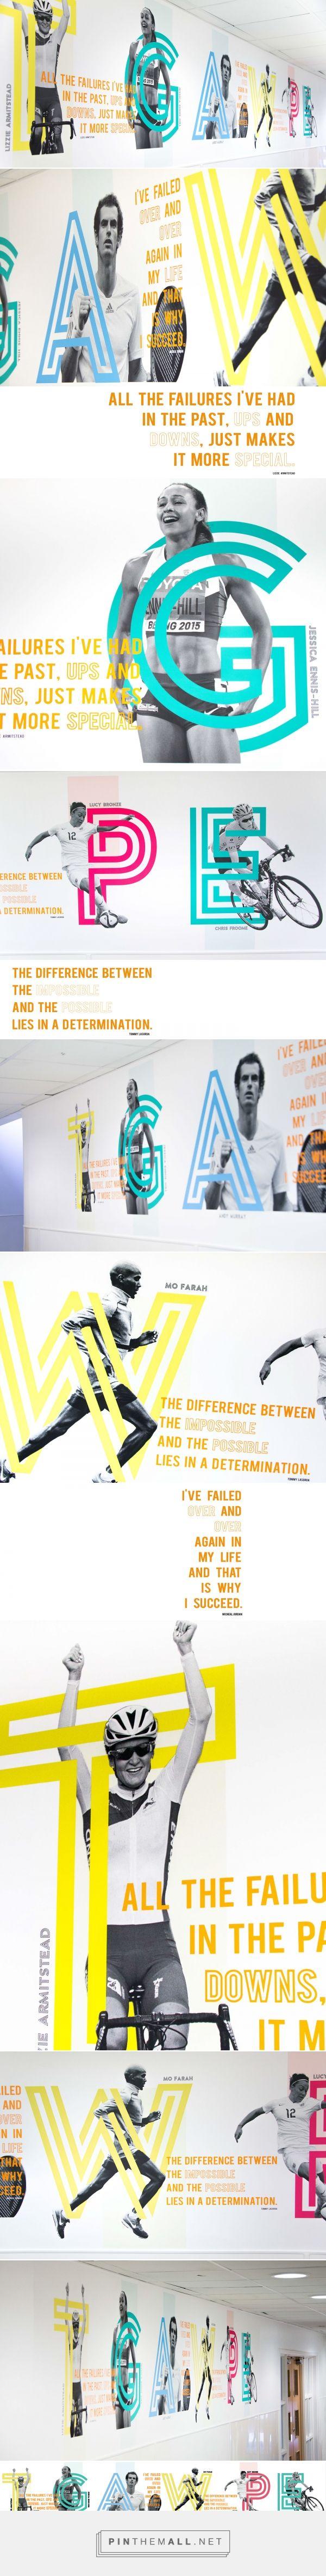 Wall of champions on Behance by Andrew Heffernan